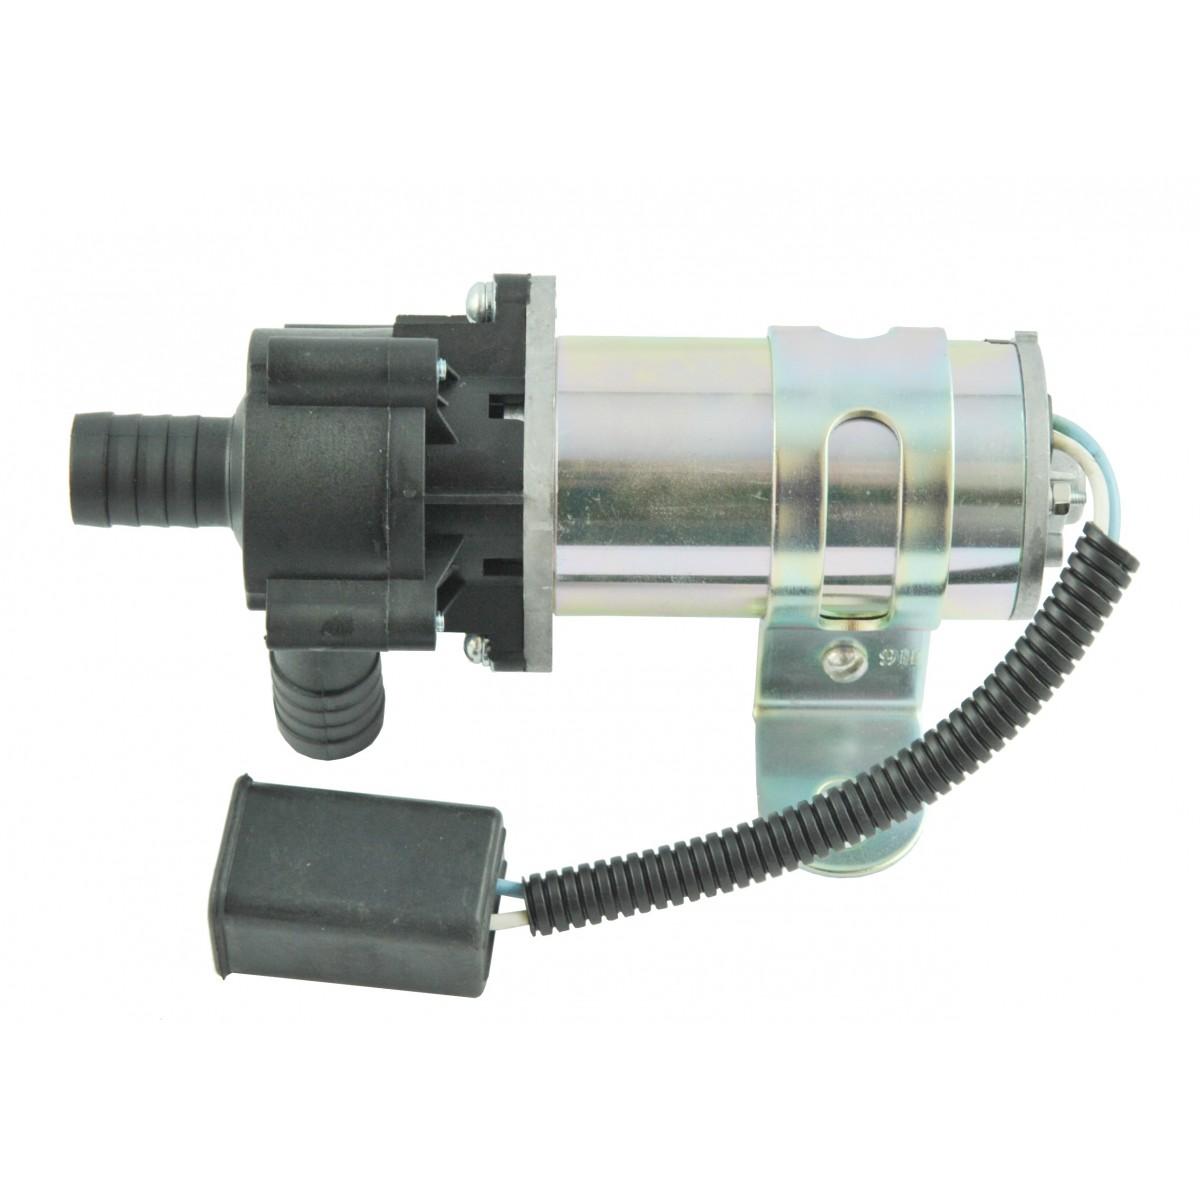 Water pump circulating pump 12V, 1200l / h